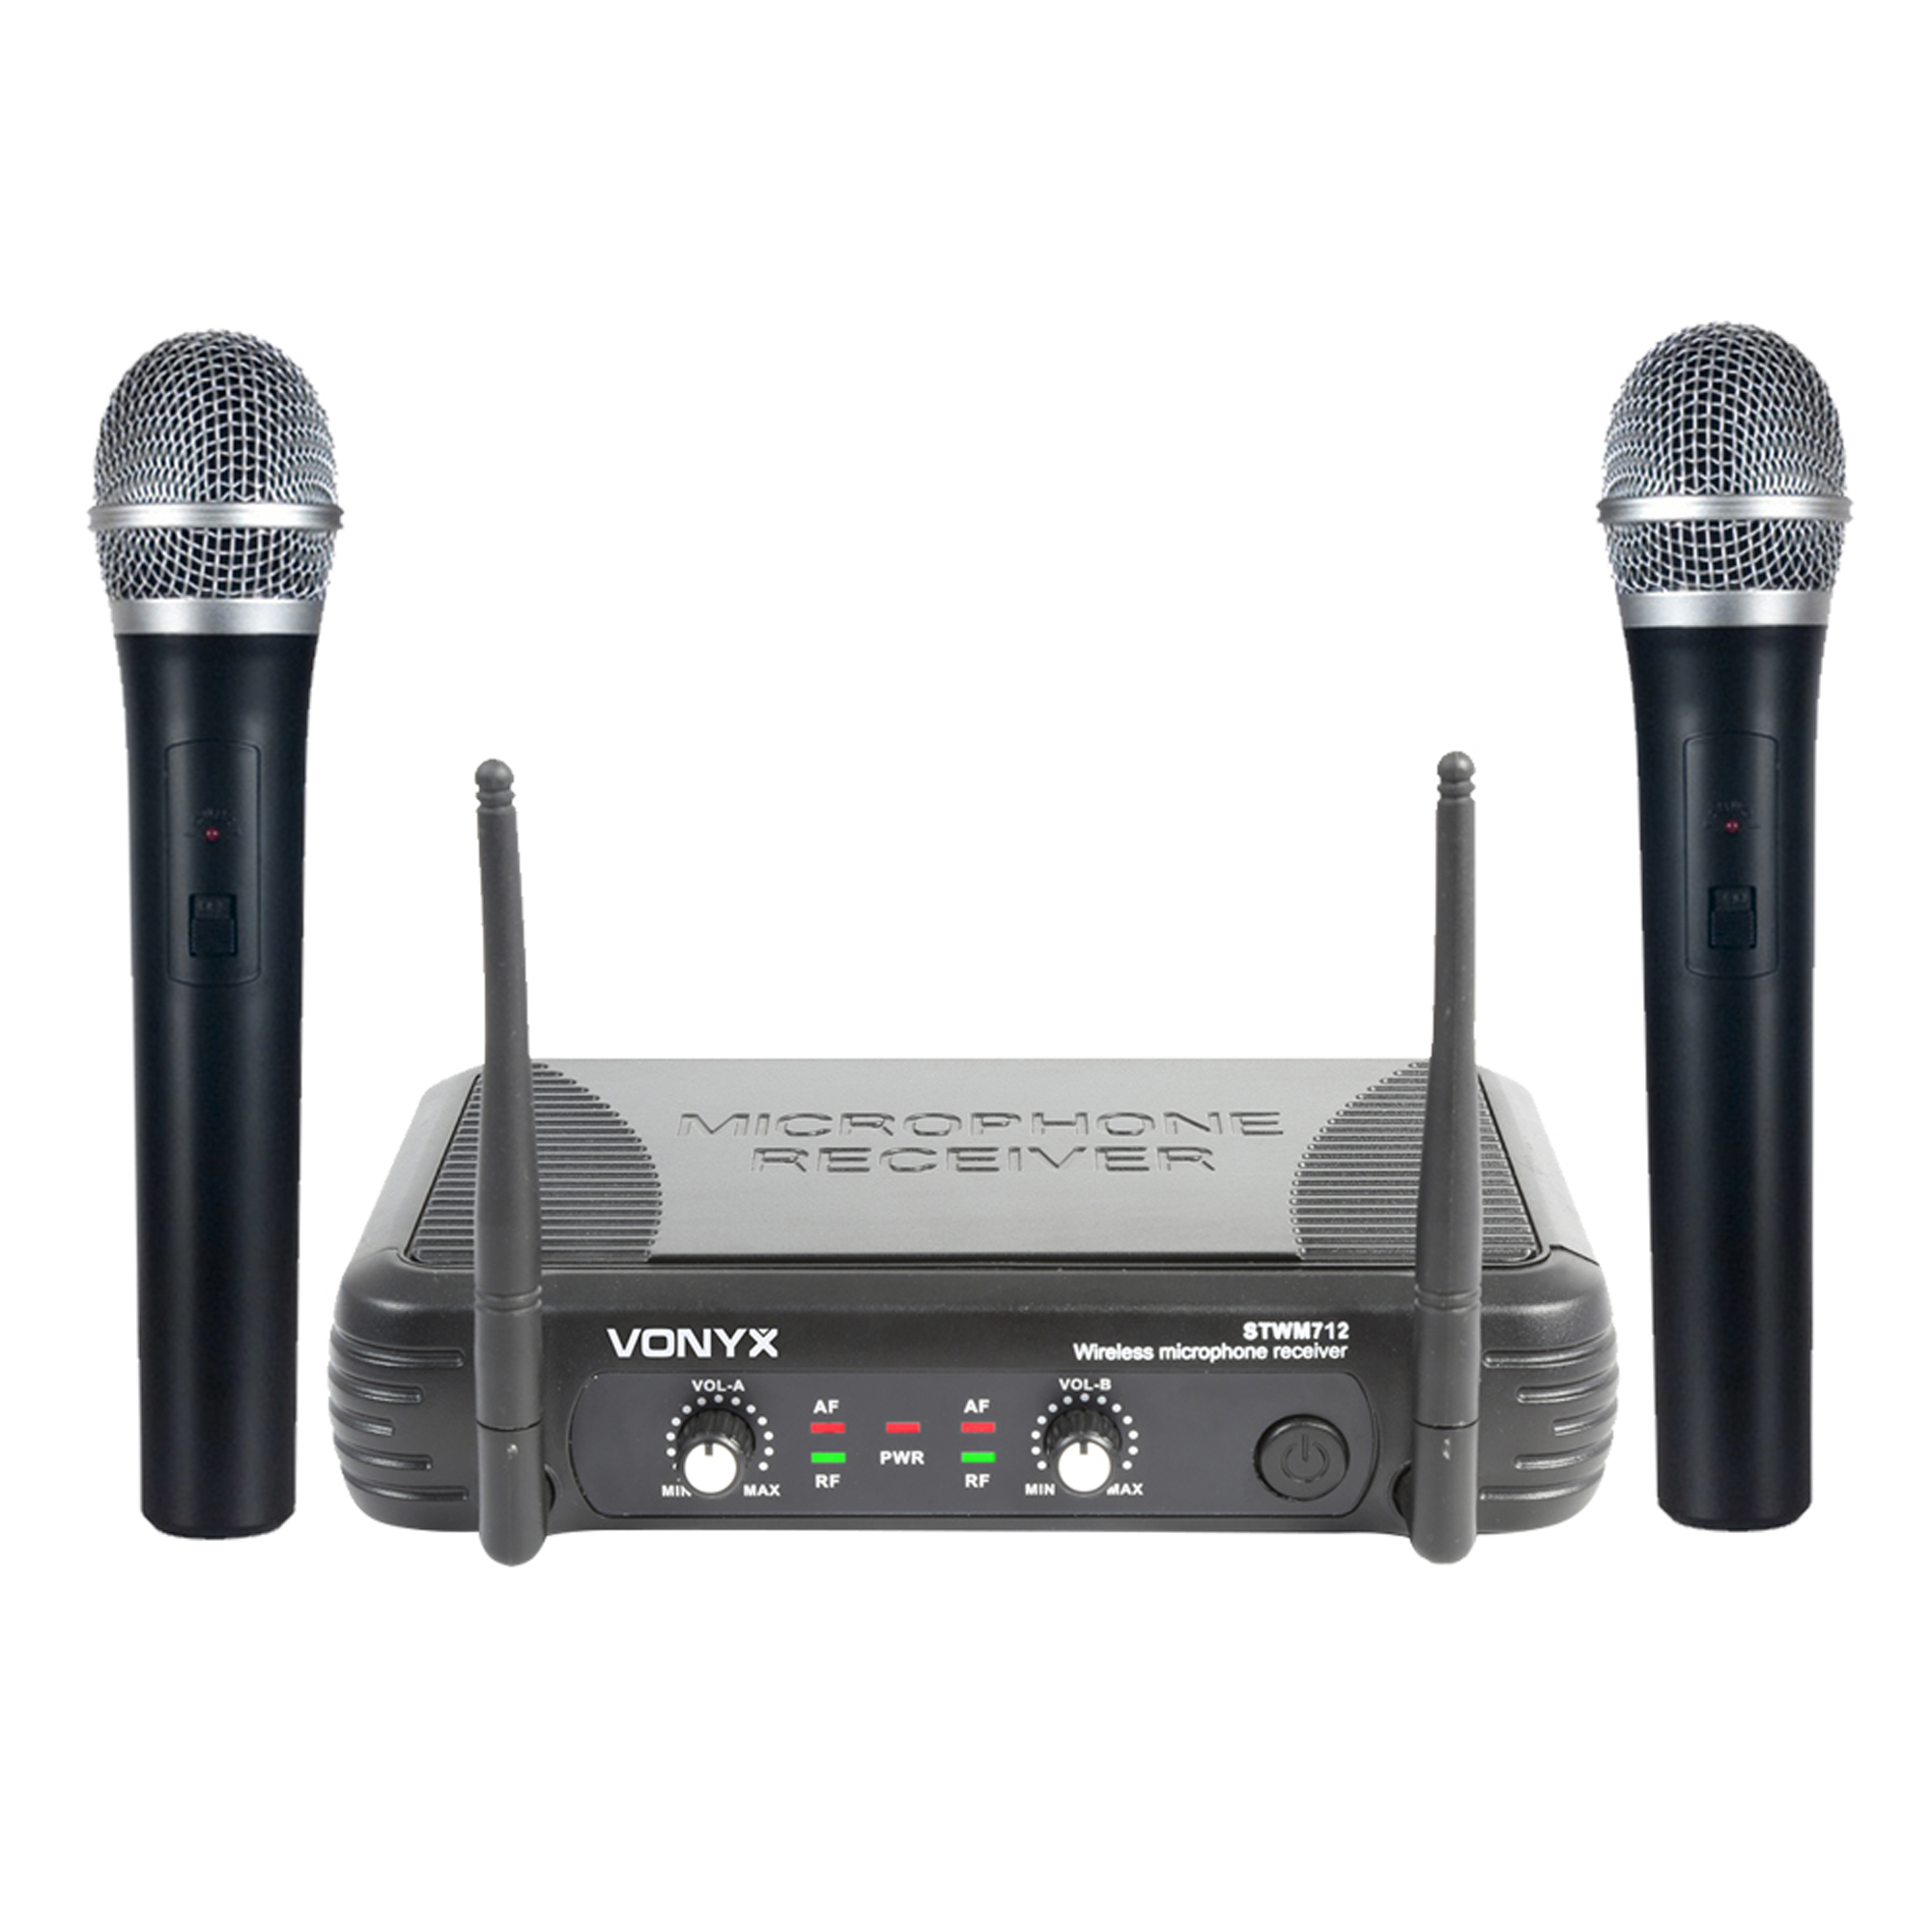 Vonyx STWM712 Wireless Handheld Microphone System, VHF 2-Channel